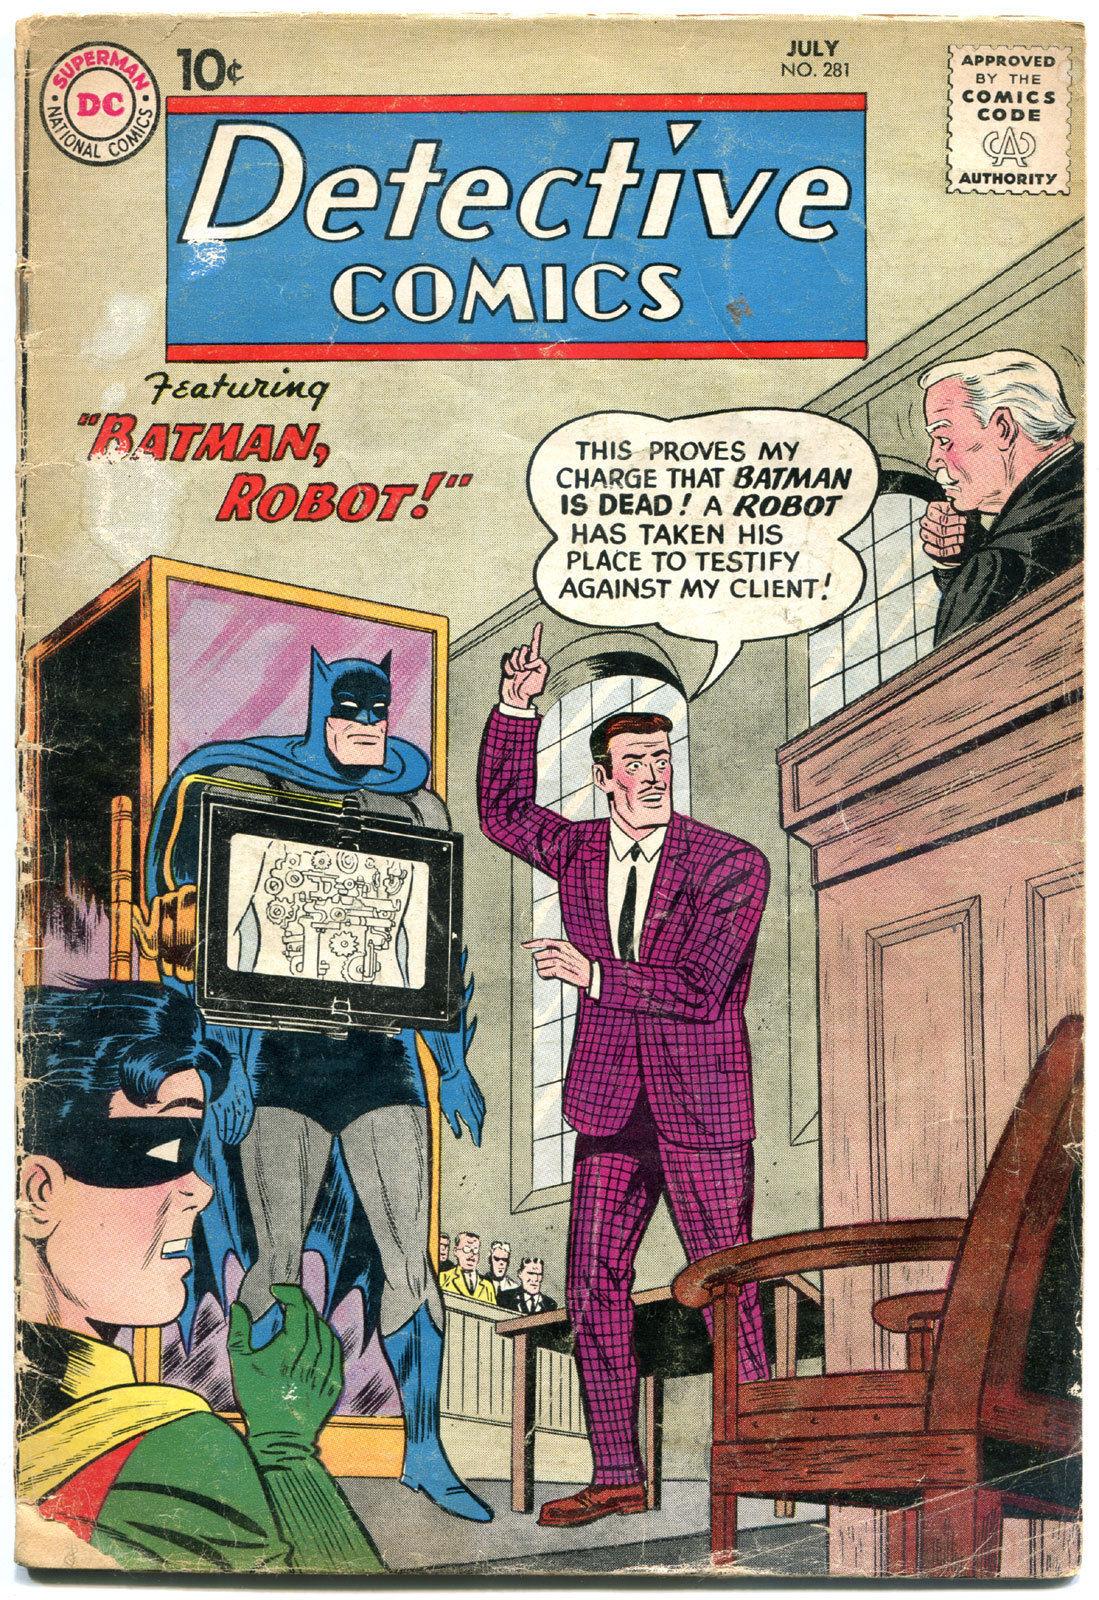 DETECTIVE COMICS #281, GD, Bob Kane, Caped Crusader, 1937 1960, more in store